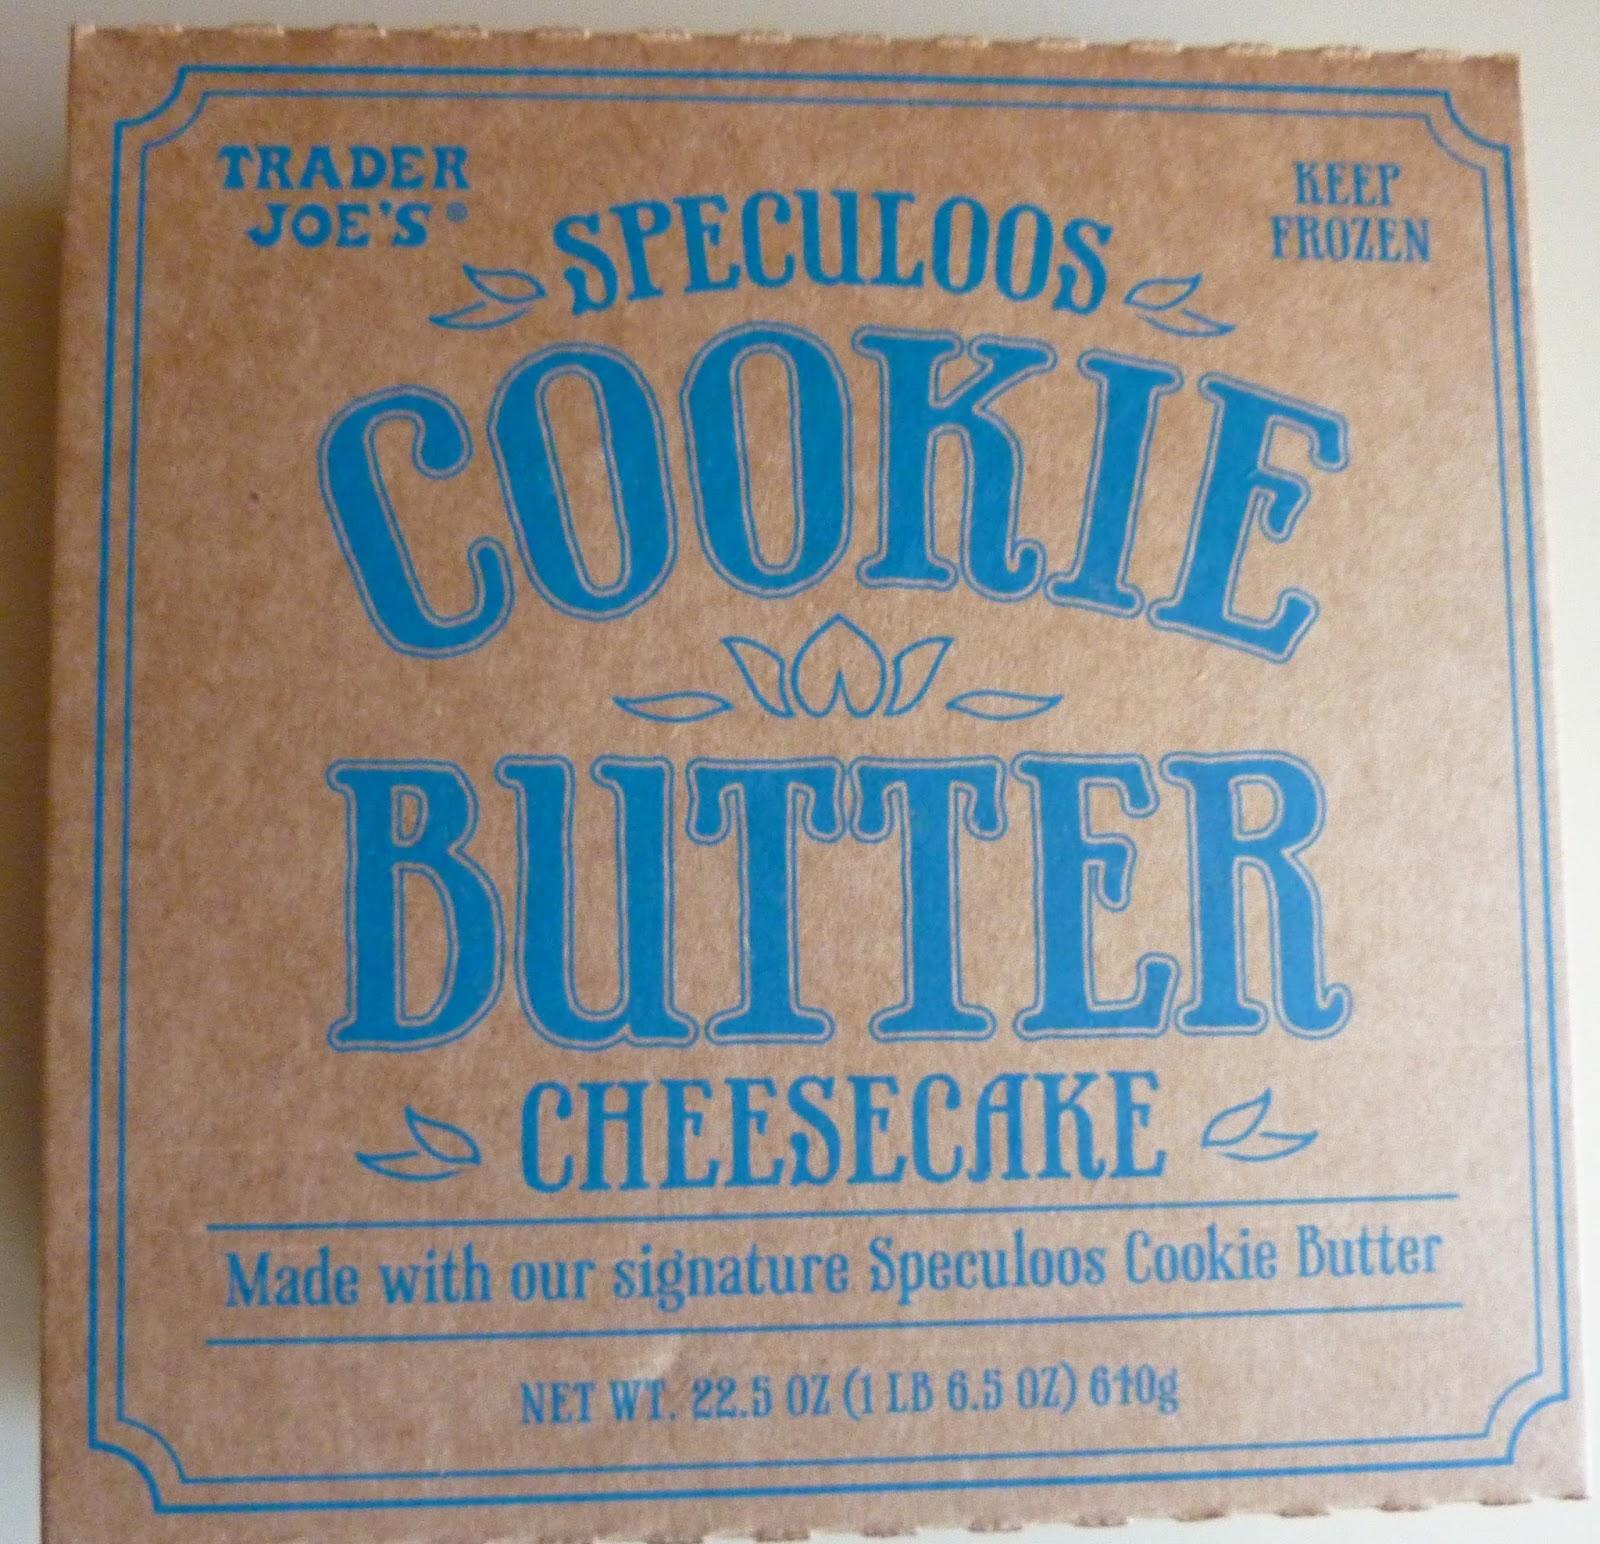 cookiebuttercheesecake.jpg